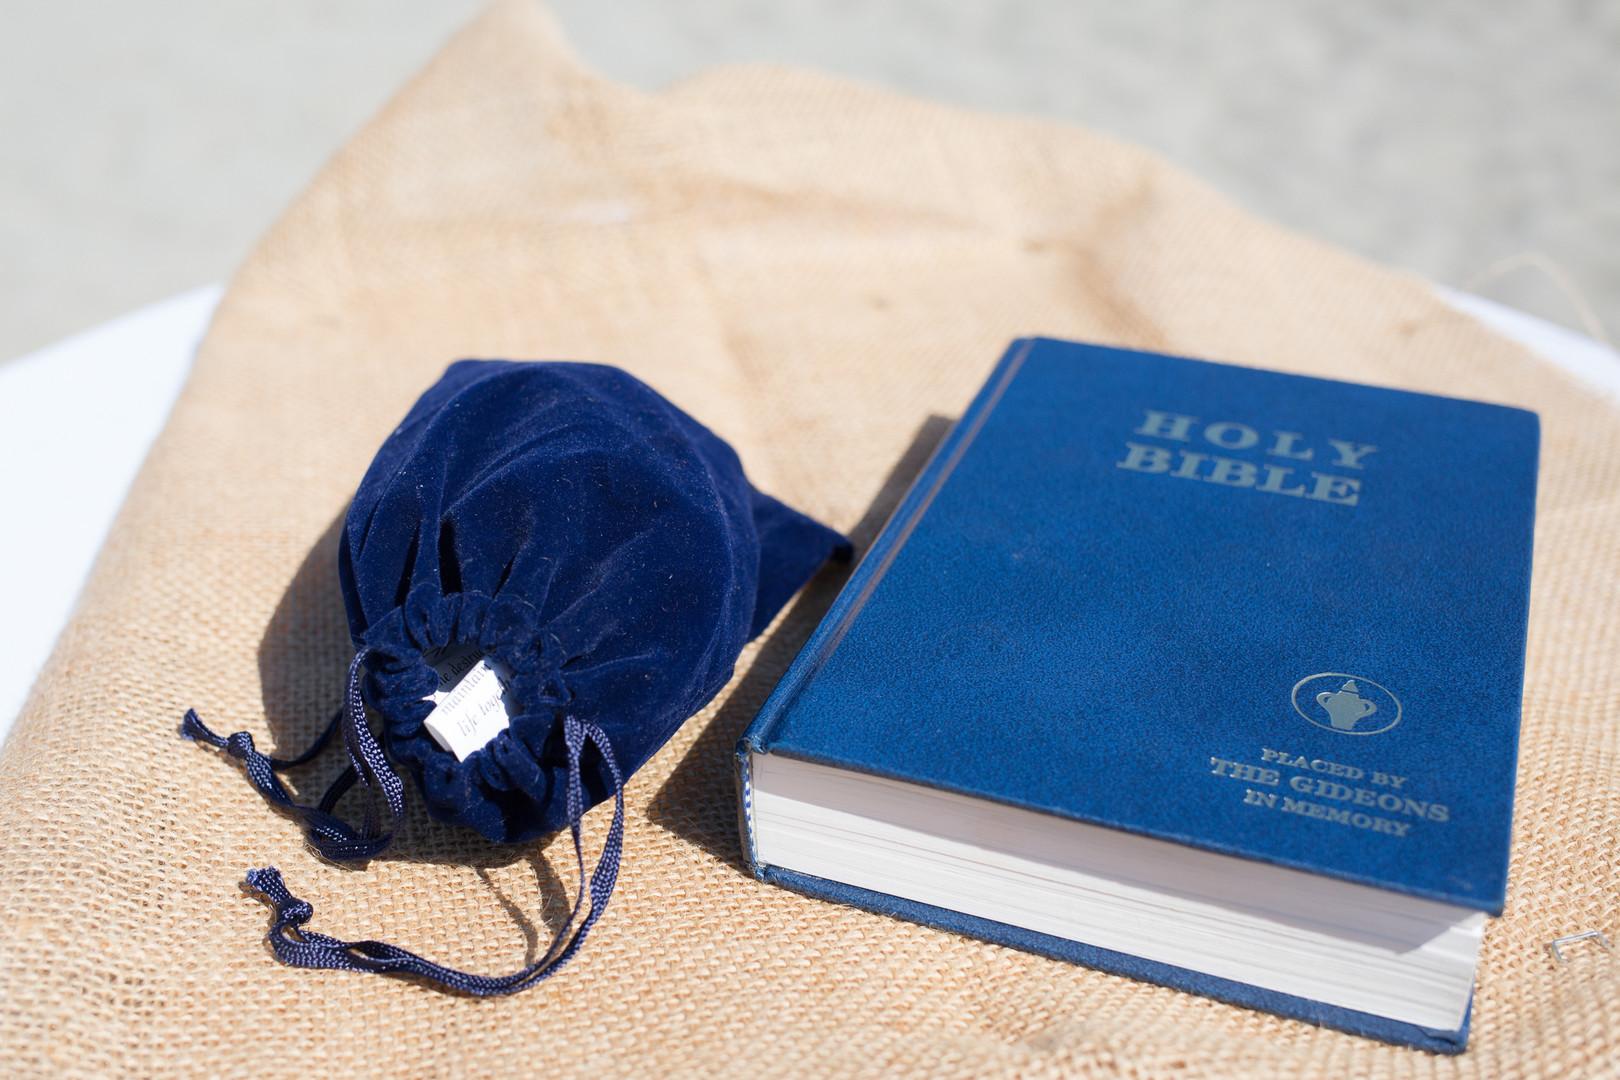 www.santabarbarawedding.com | Renoda Campbell | Weddings by Bobbie | Ventana Grill Events | Bible | Ceremony